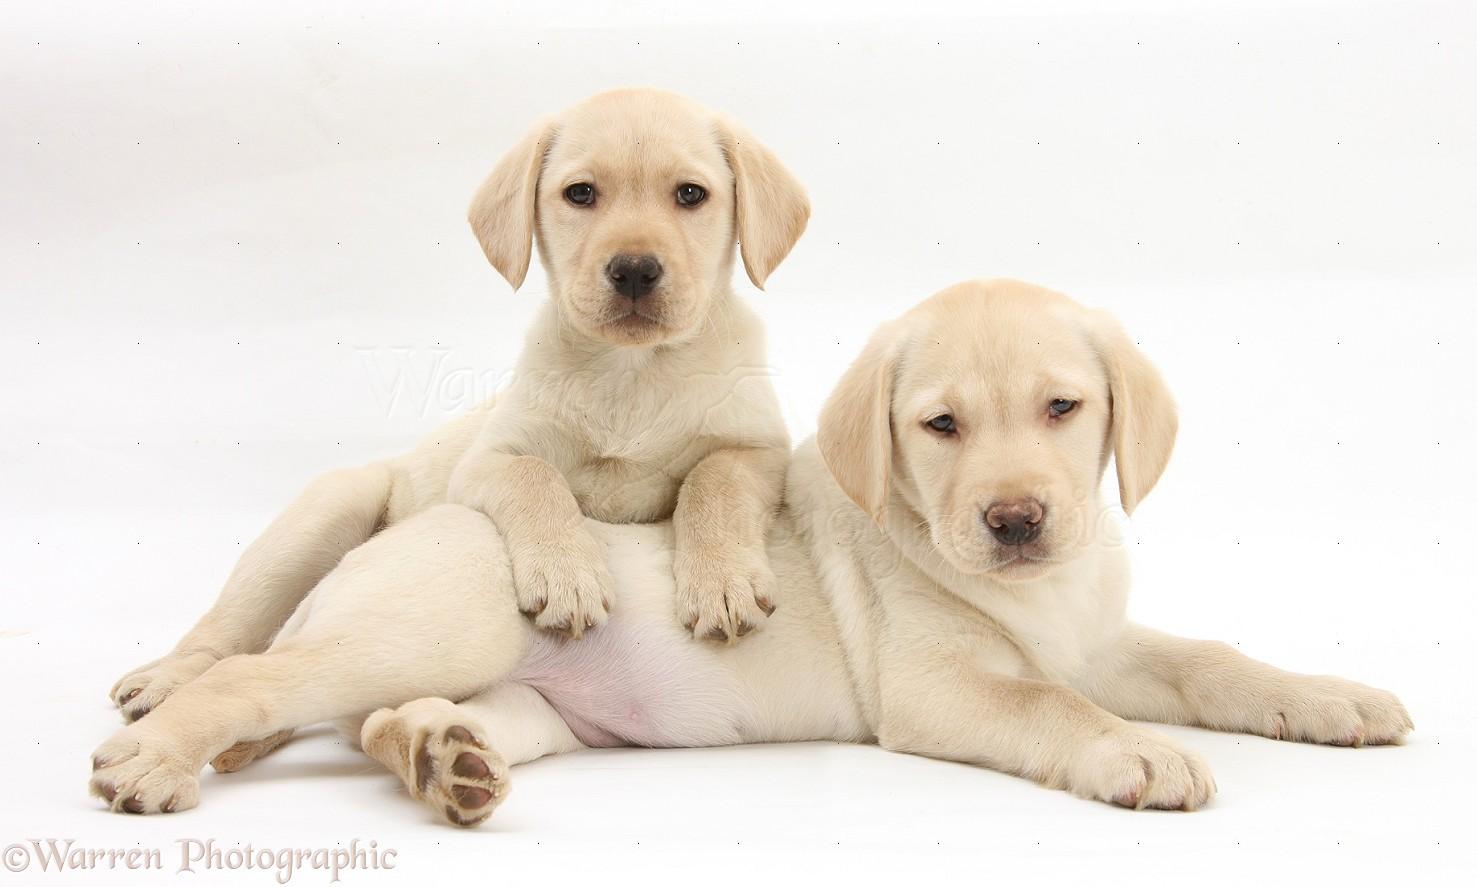 lab puppy dogs wallpaper desktop wallpaper html filesize 800x600 412k 1477x887